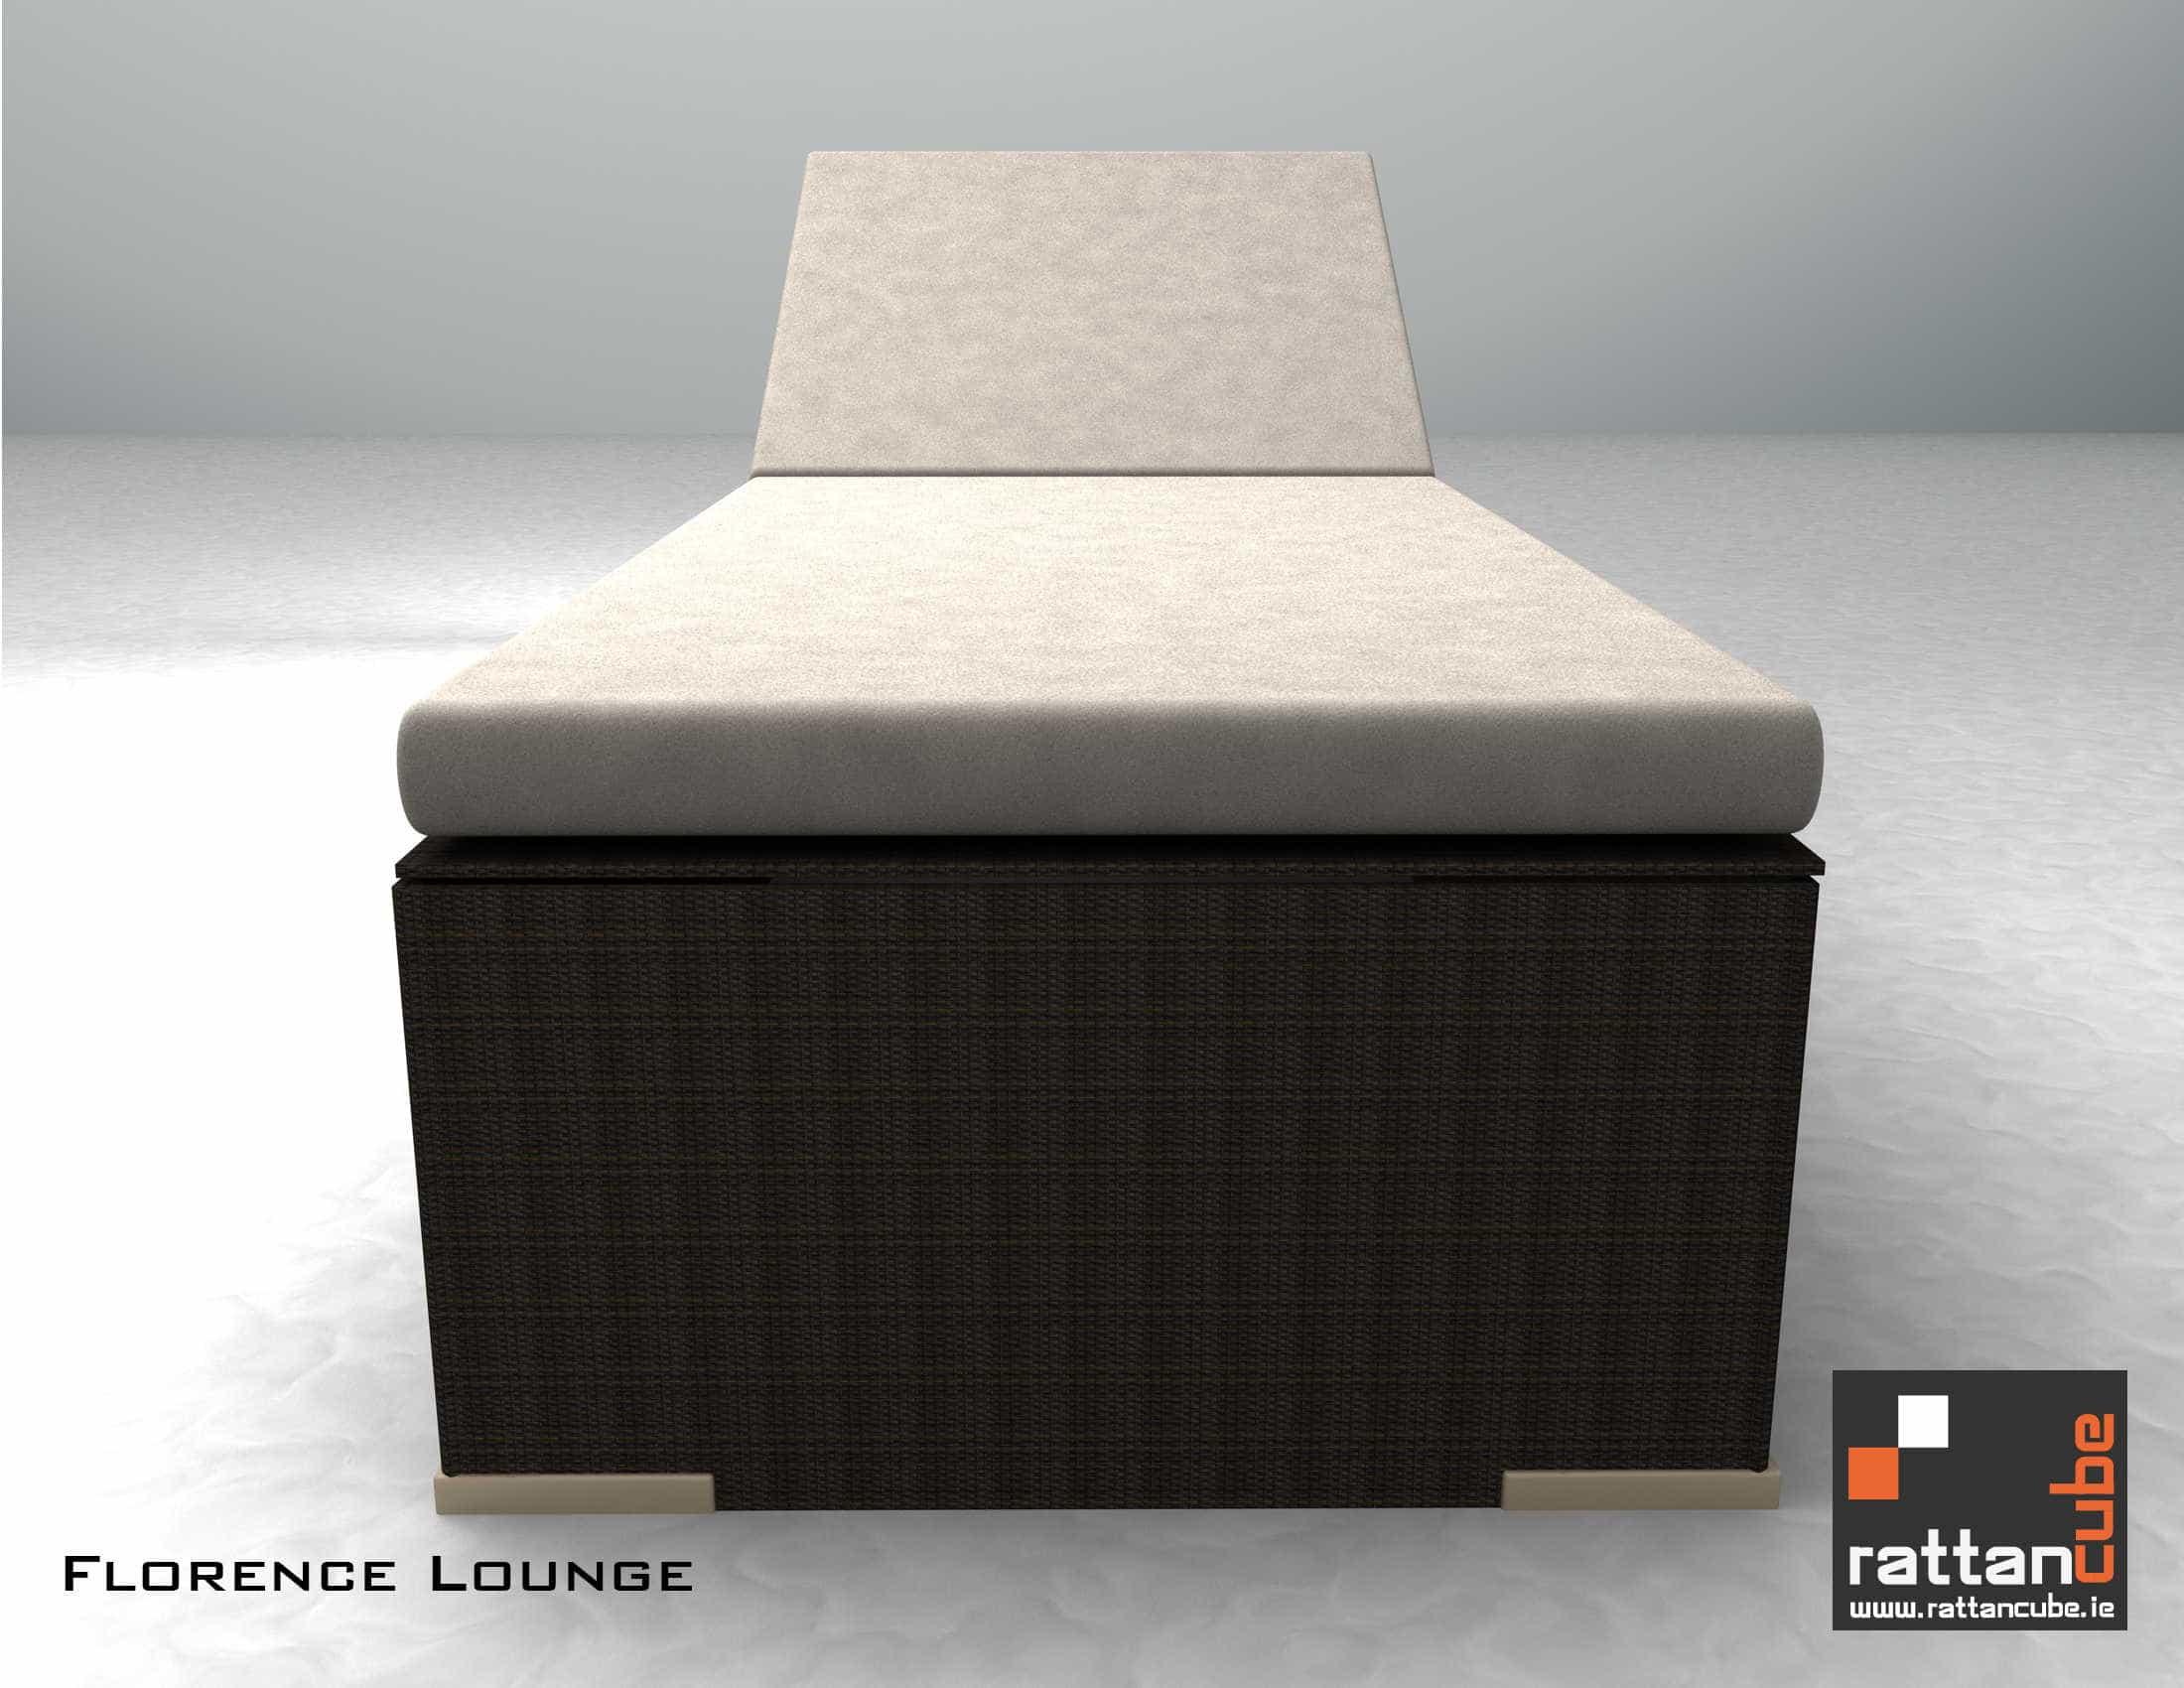 Florence Lounger For Your Garden Or Patio Area Sleek